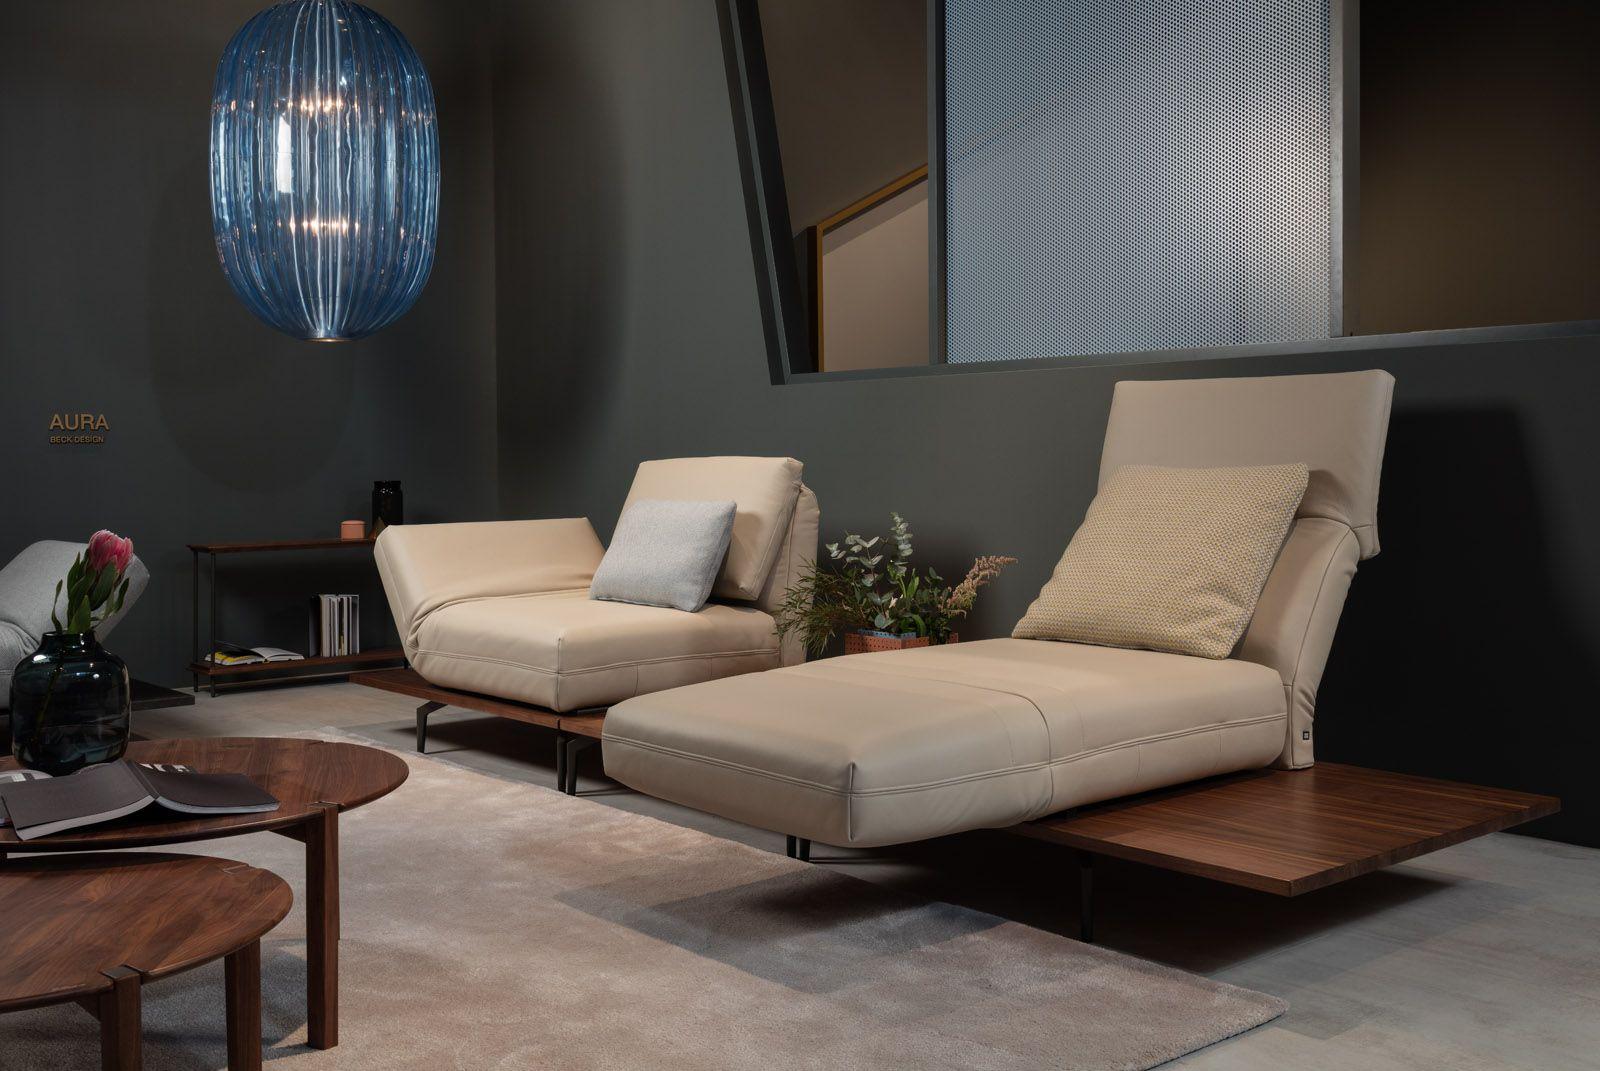 Rolf Benz Aura Authentic Elegance For The Living Room Rolfbenz Luxurysofa Designersofa Luxurylivingroom Moder Luxury Living Room Luxury Sofa Sofa Design